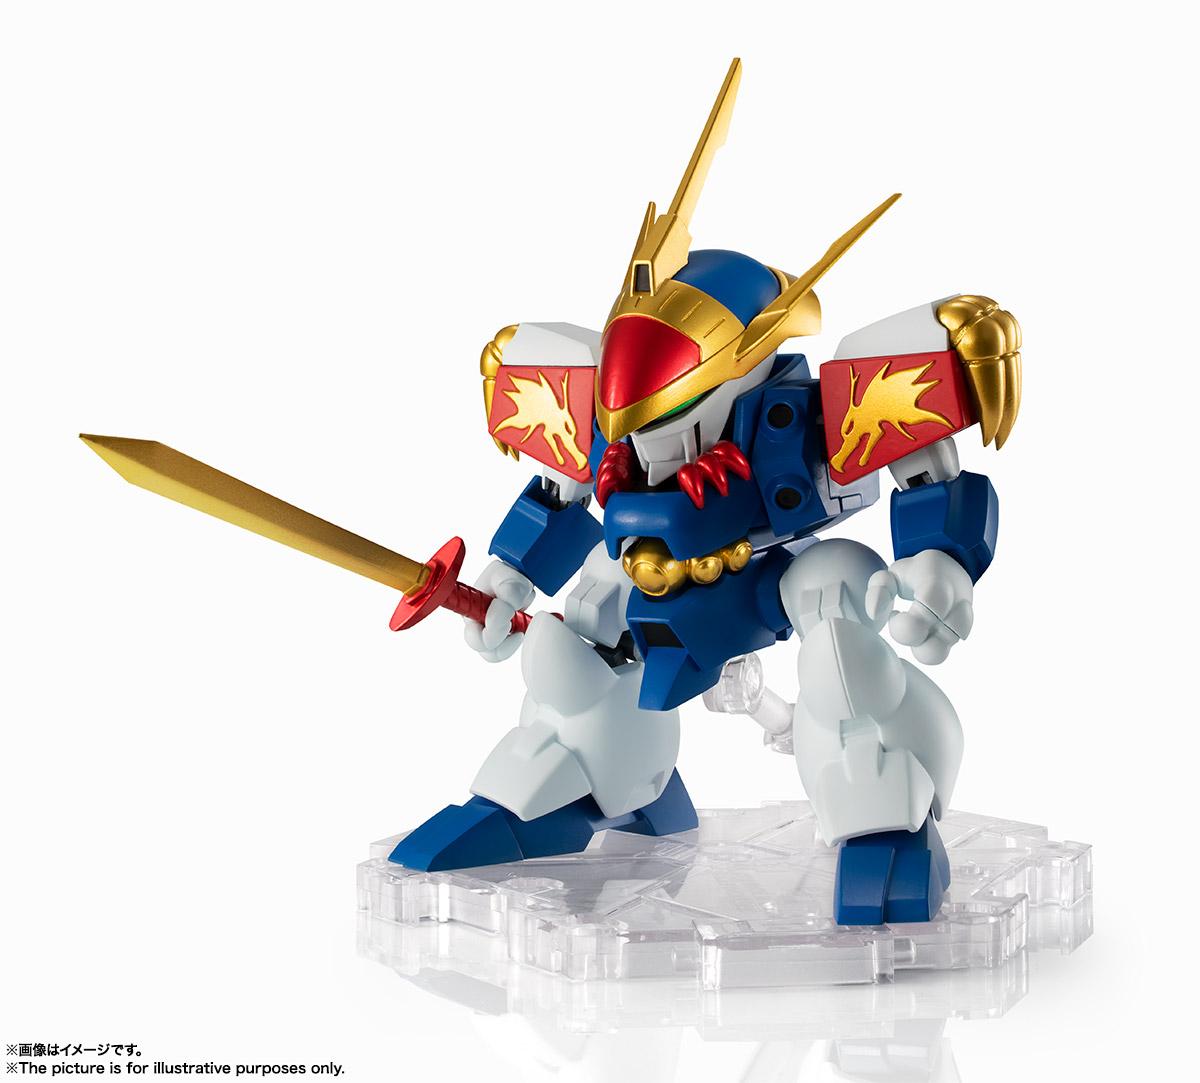 NXEDGE STYLE [MASHIN UNIT] 『龍神丸』魔神英雄伝ワタル 可動フィギュア-002